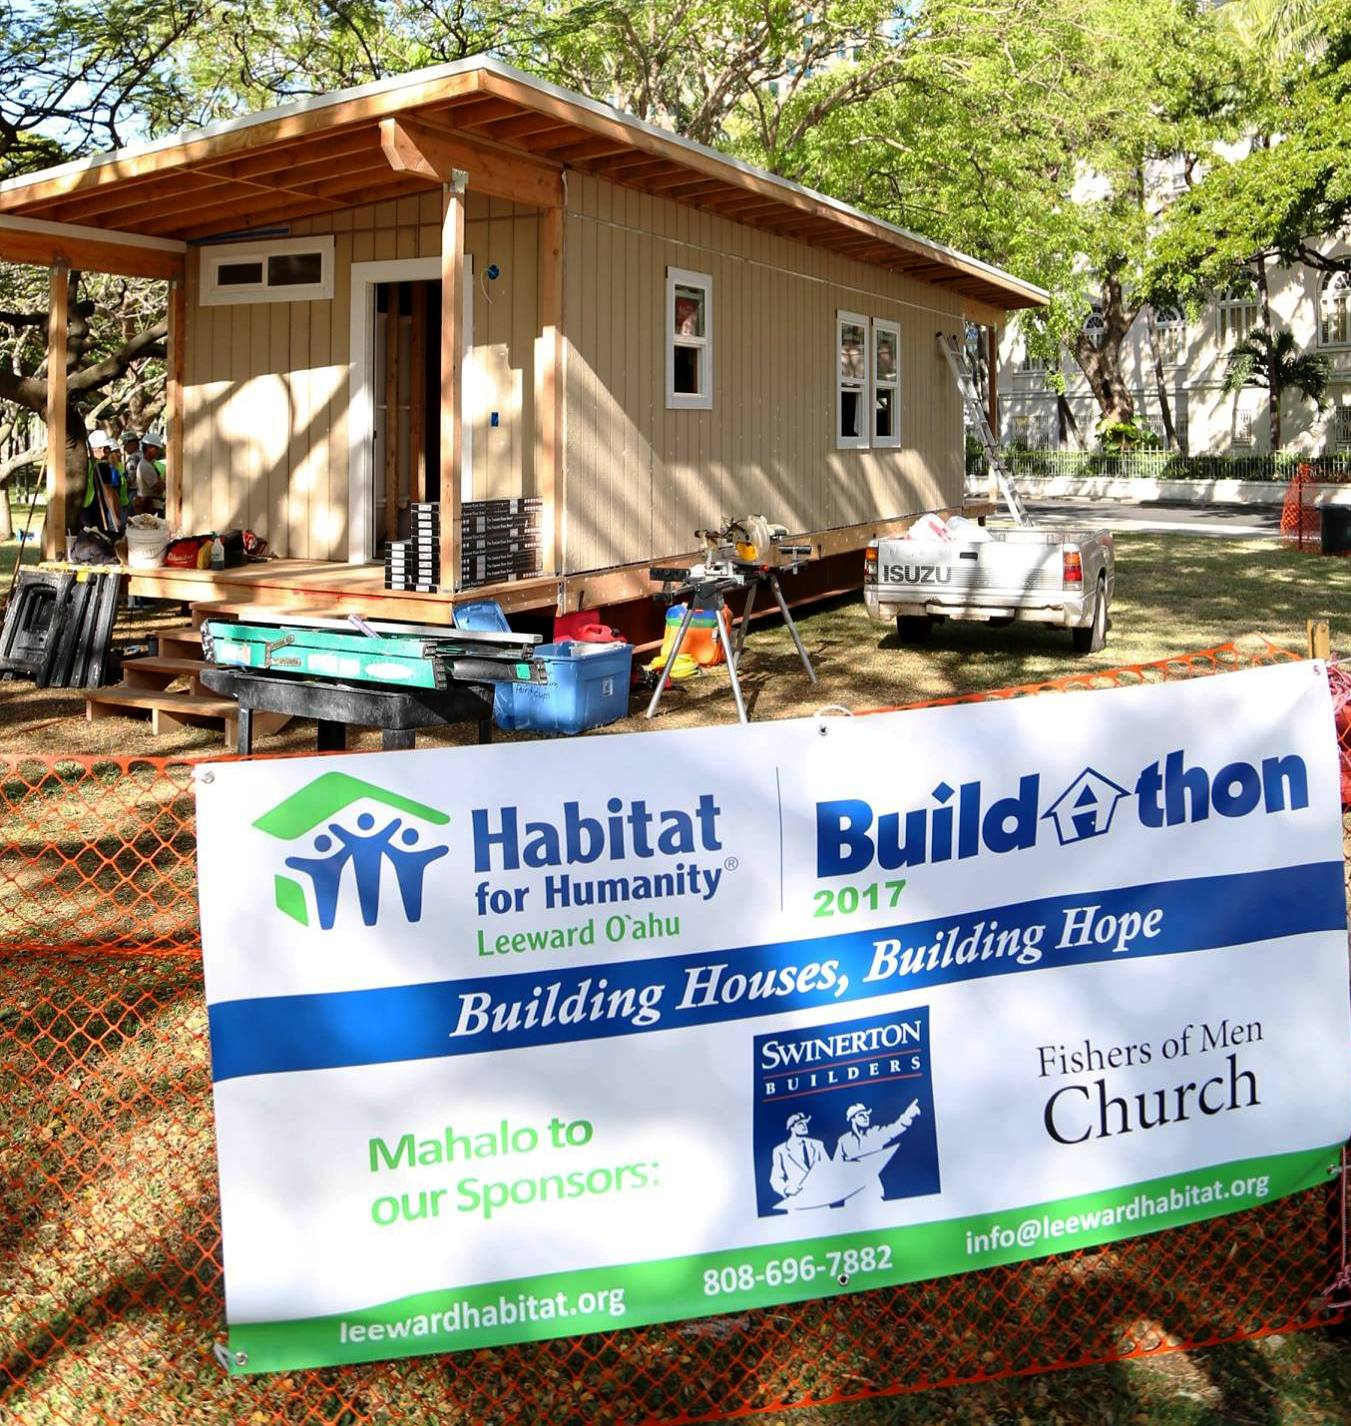 tiny house news. Accessory Dwelling Unit At Capitol Grounds, Courtesy Hawaii Association Of Realtors Tiny House News